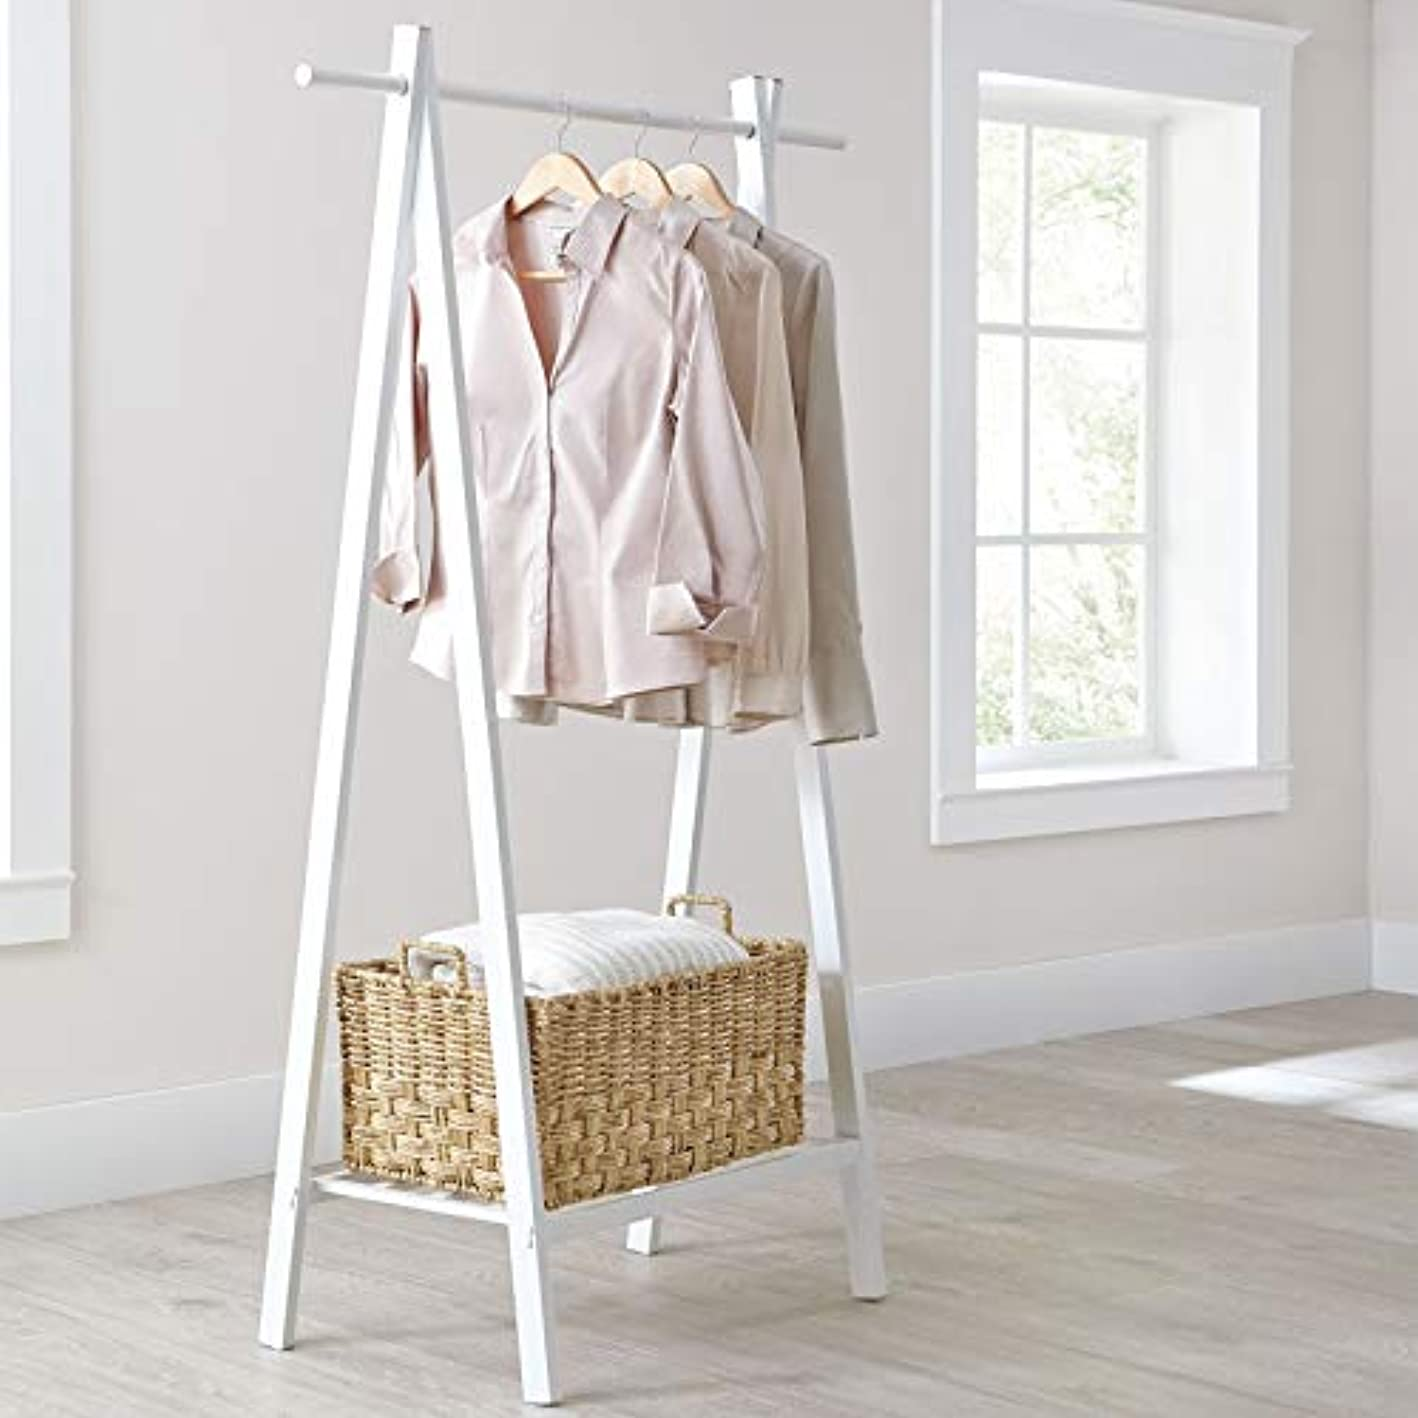 BrylaneHome Mia Metal Garment Rack - White